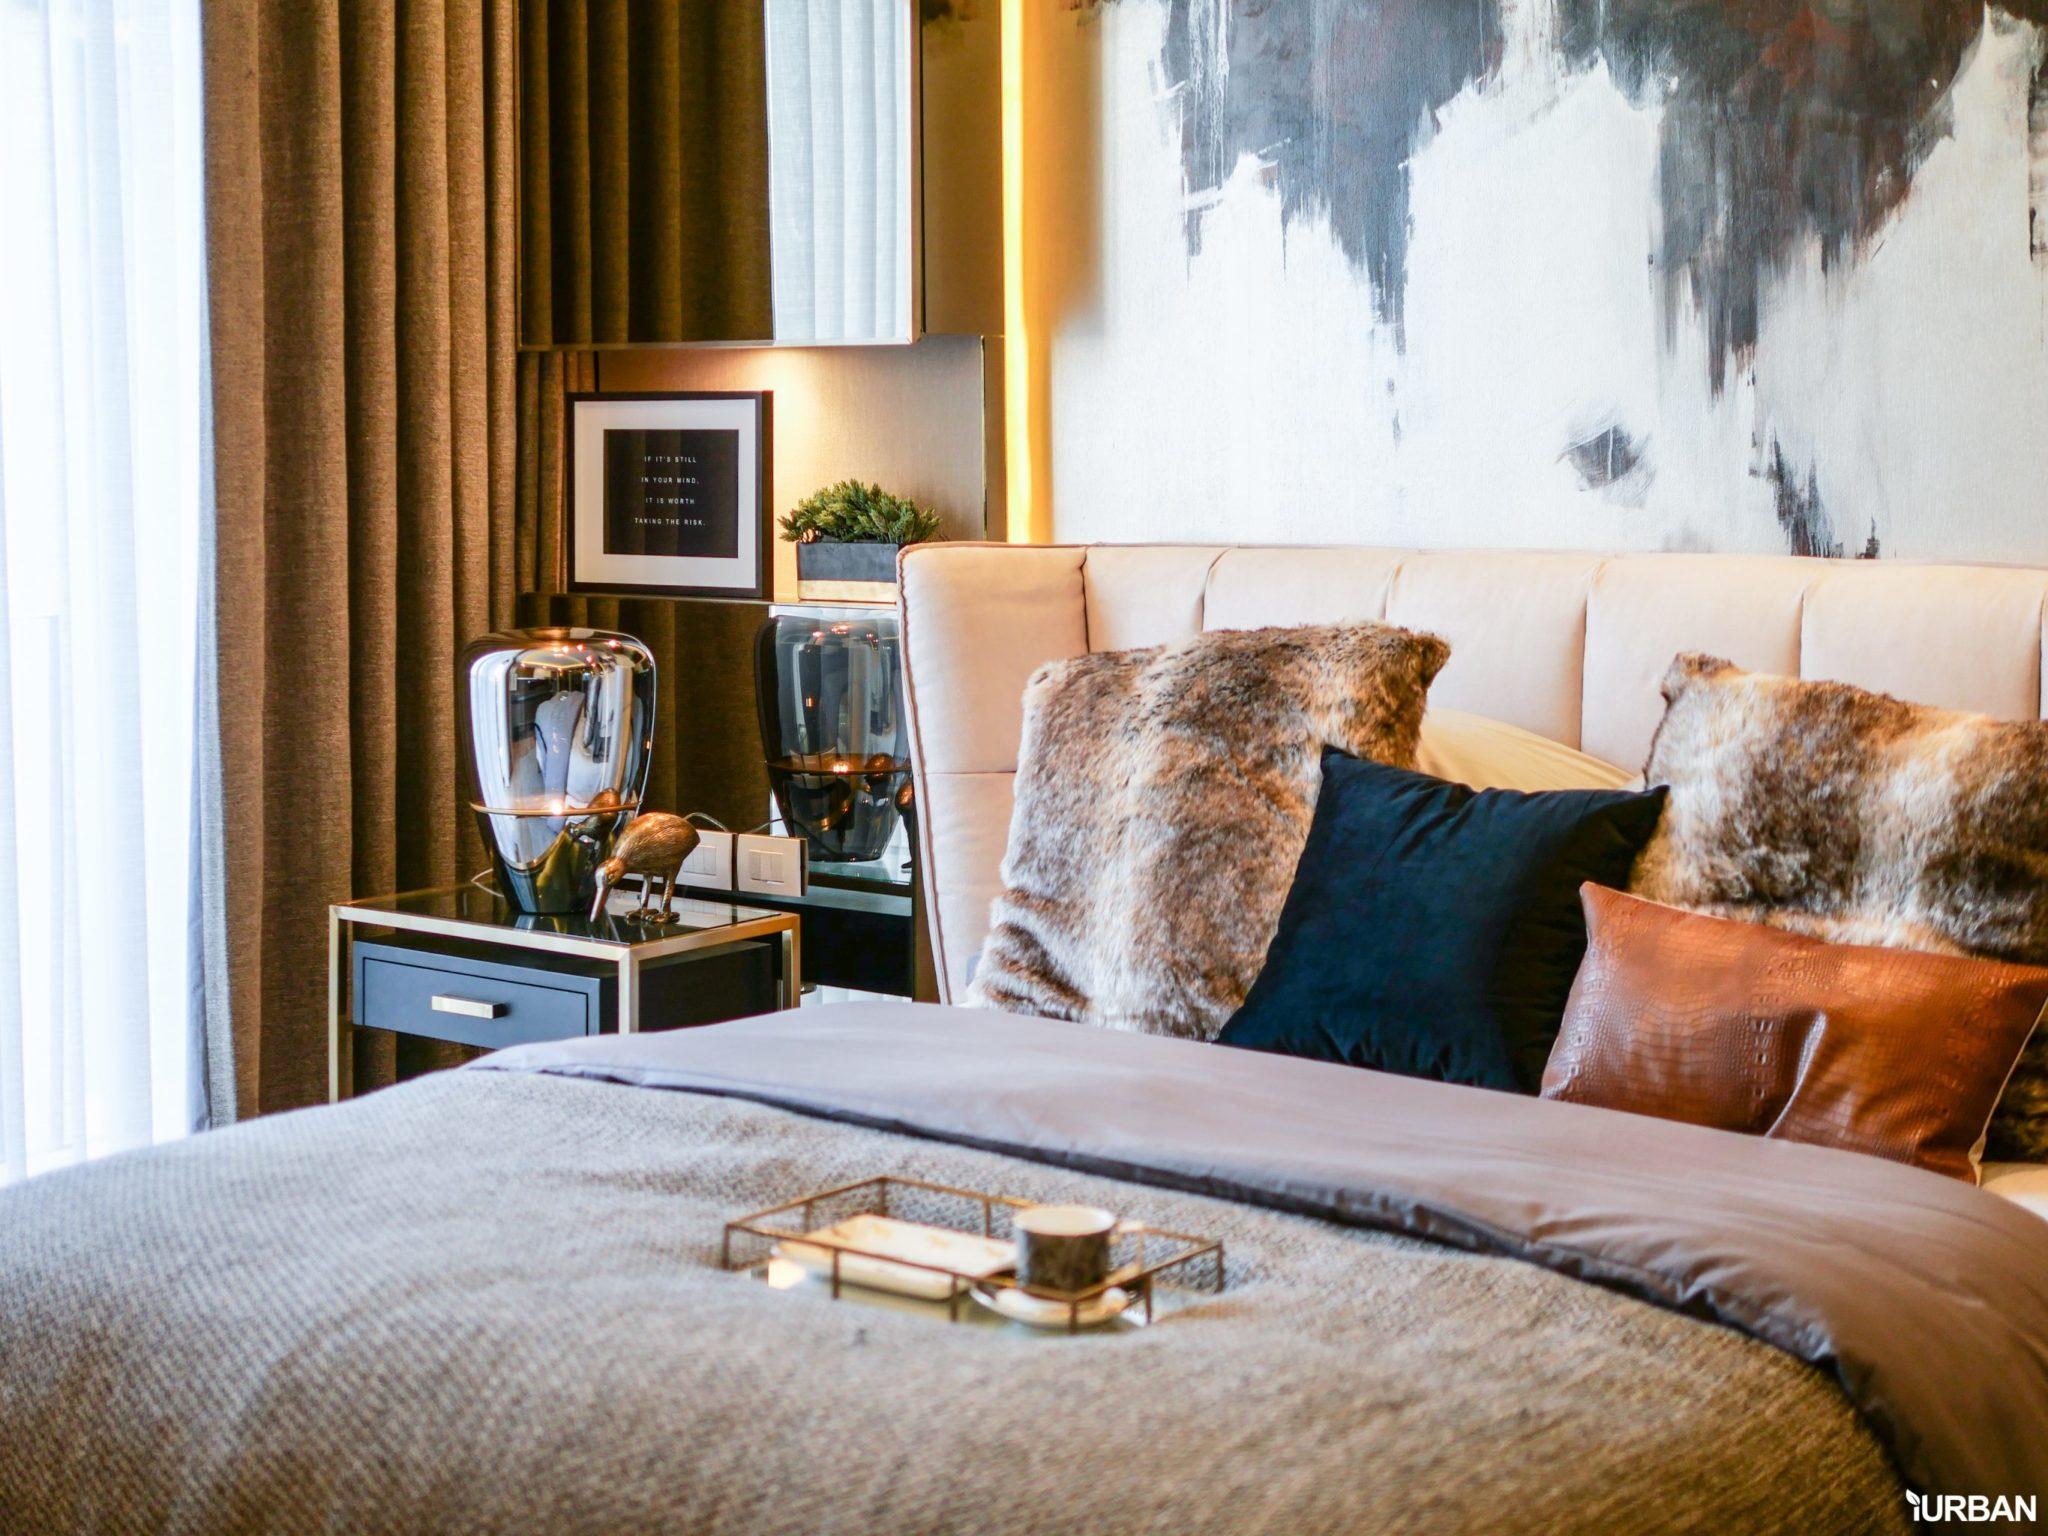 AIRES RAMA9 รีวิว Luxury Townhome 3.5 ชั้น + Rooftop ออกแบบสวย ย่านพระราม9 (ใกล้ รพ.สมิติเวช) 50 - AIRES